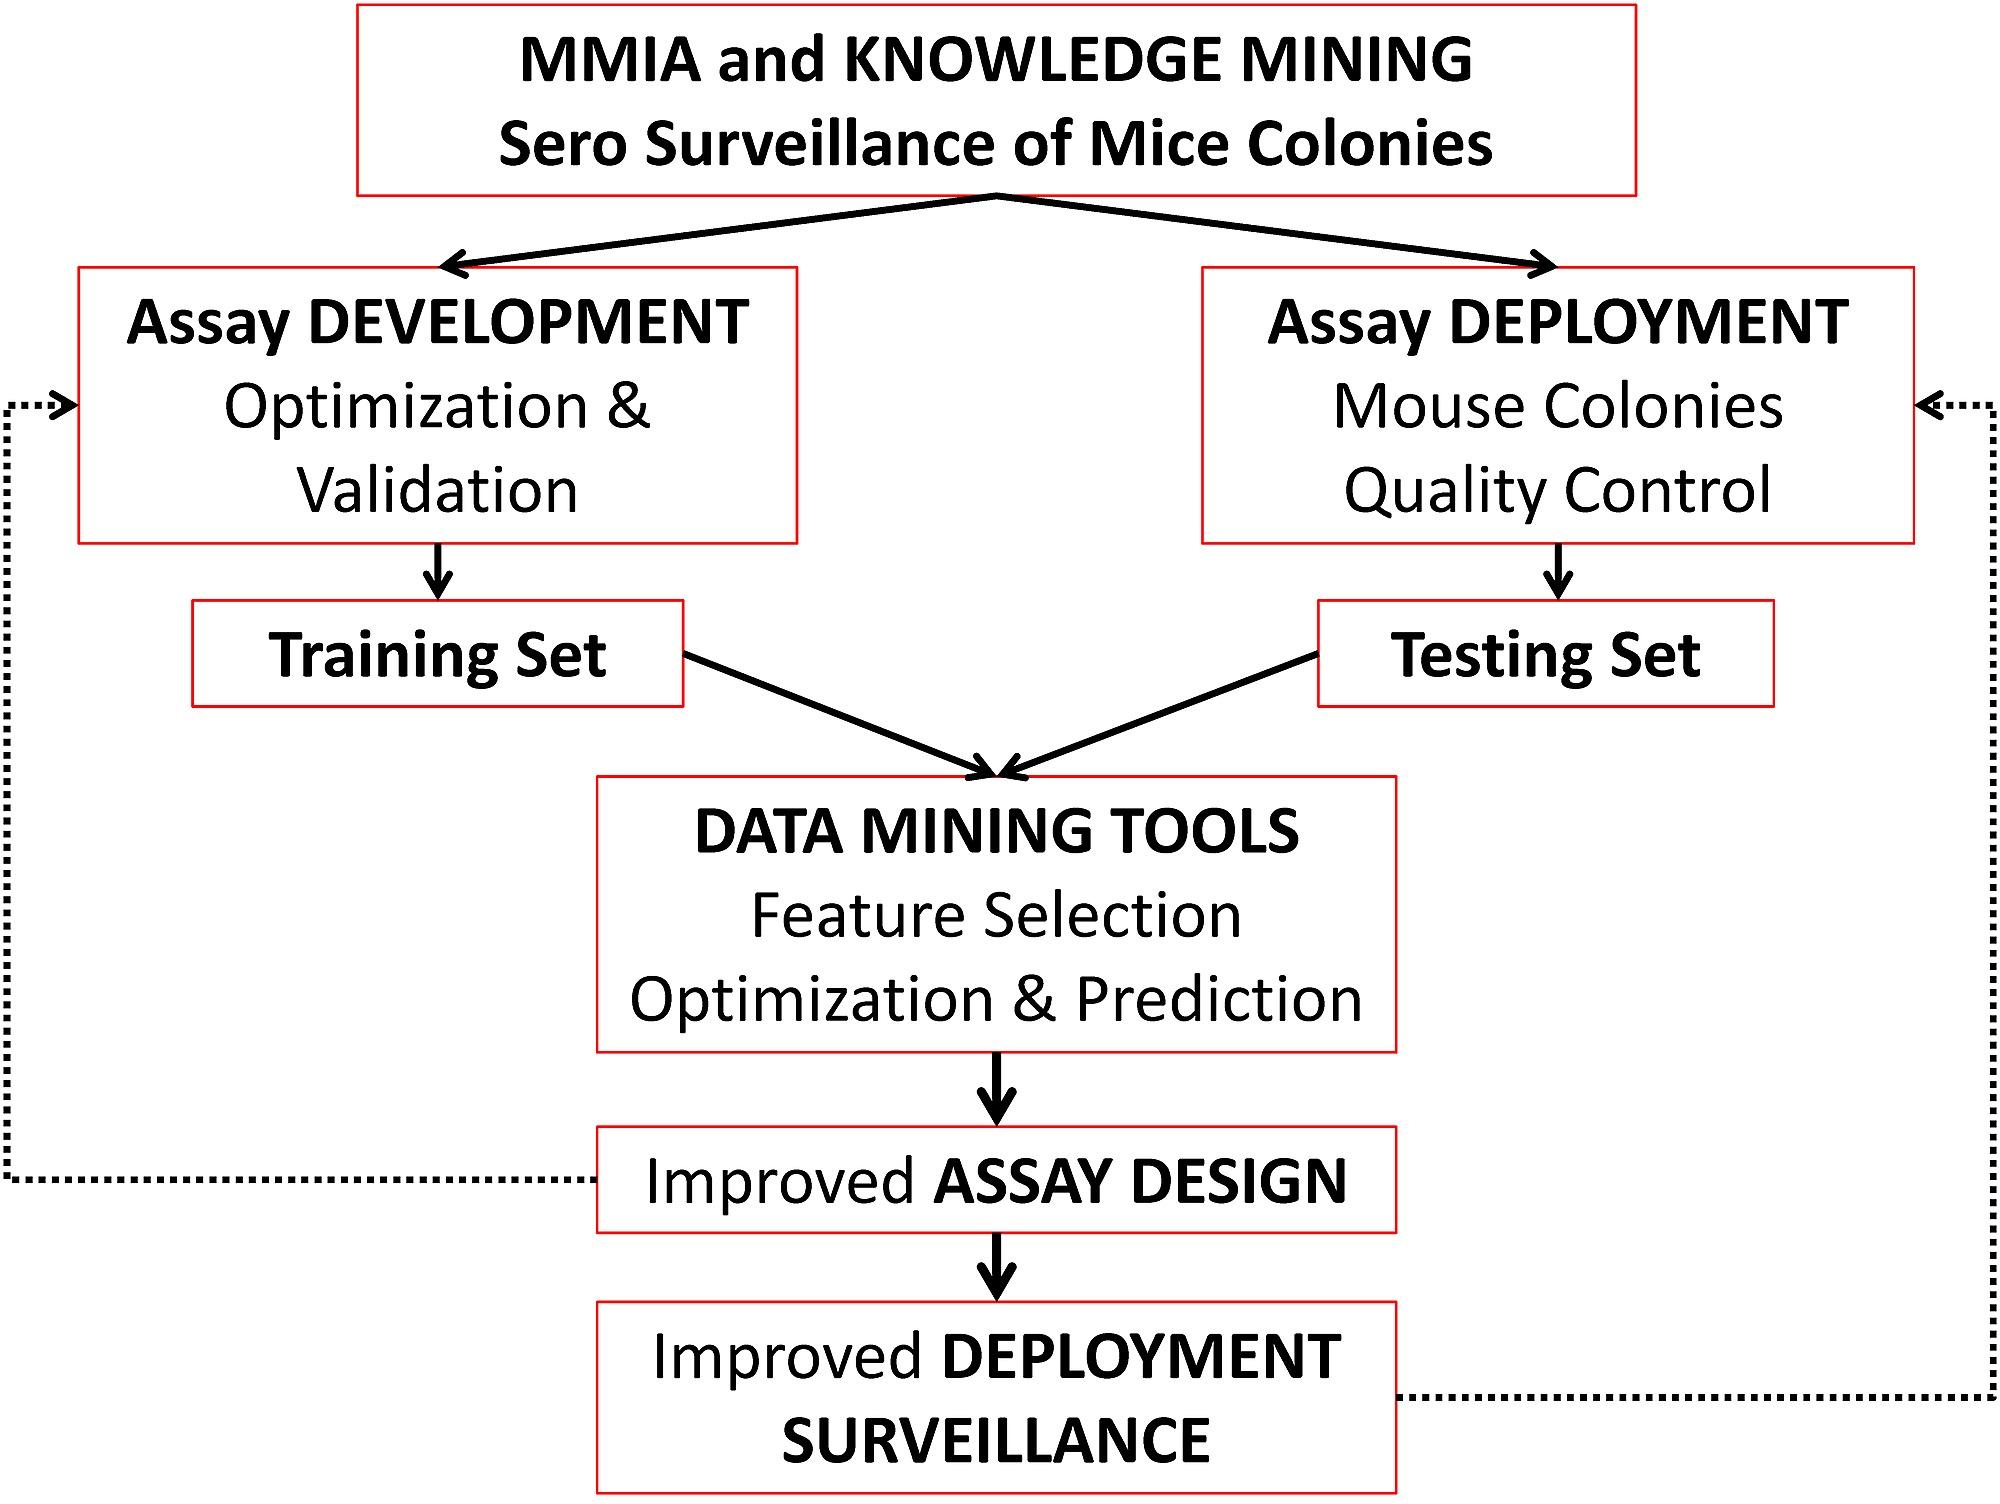 Flow Chart Of The Data Mining Approach Sero Surveillance Of Mice